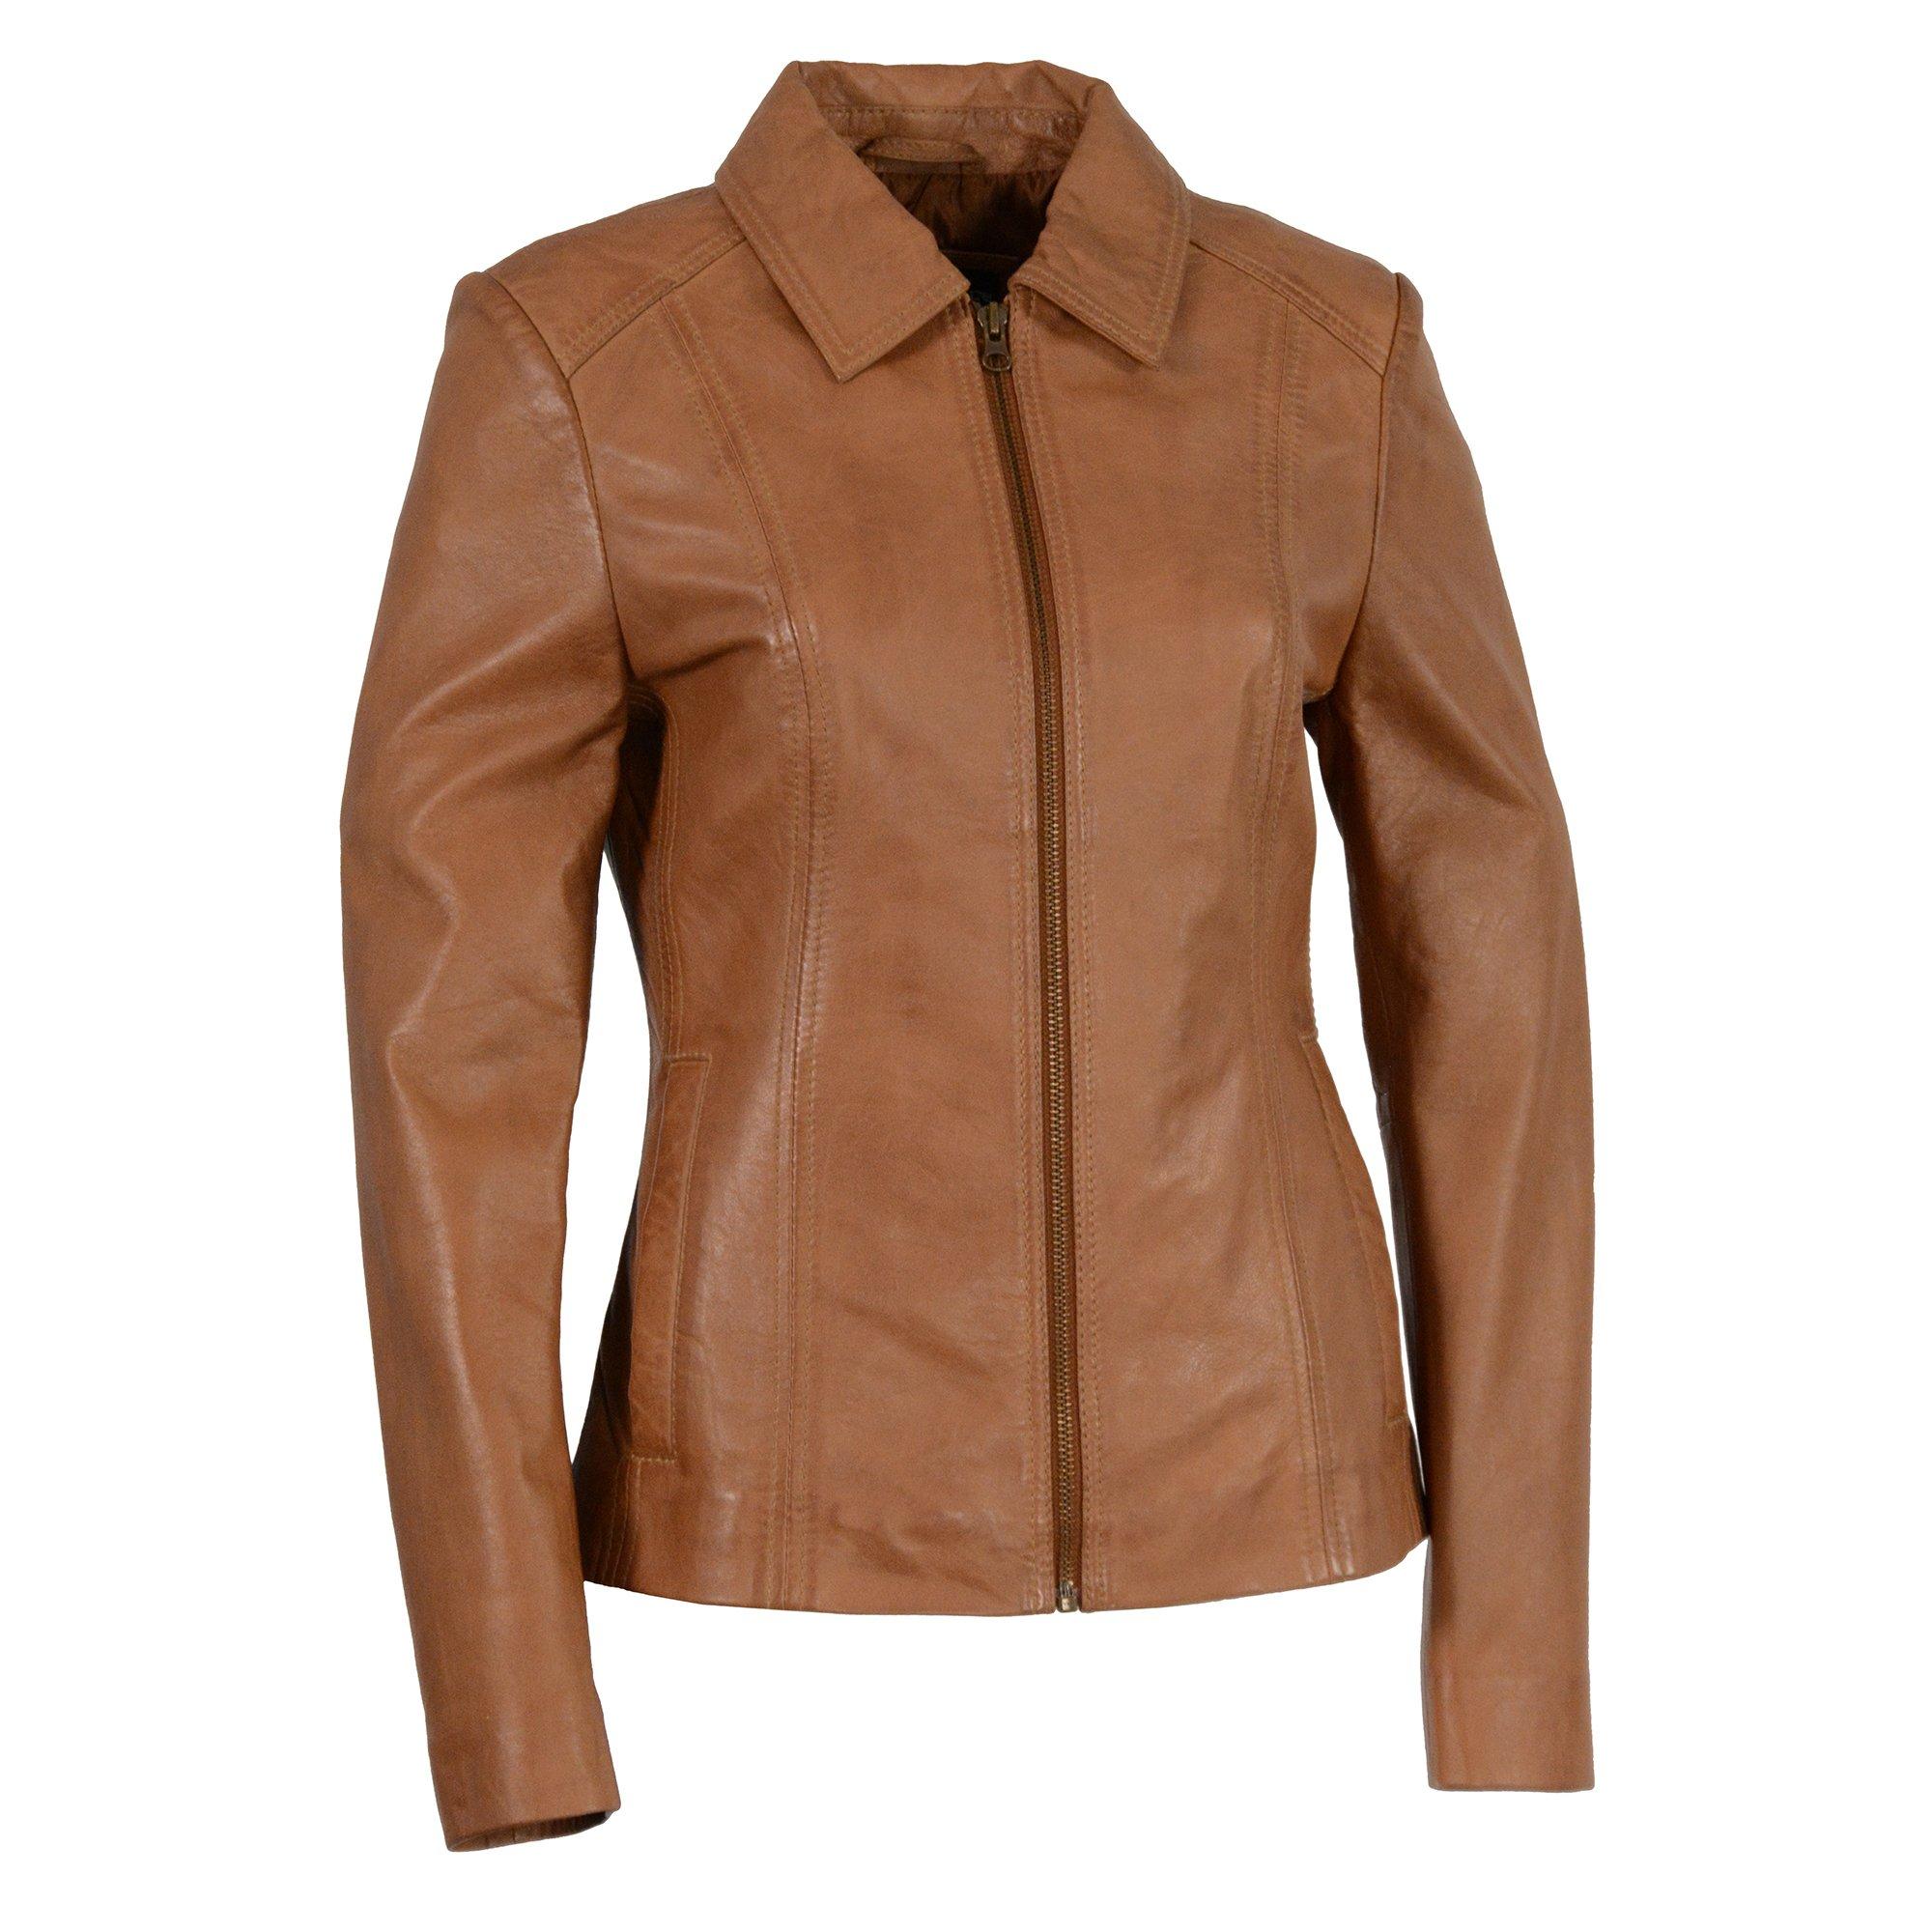 Milwaukee Leather Women's Zipper Front Scuba Jacketwith  Shirt Collar (Saddle, 4X-Large), 1 Pack